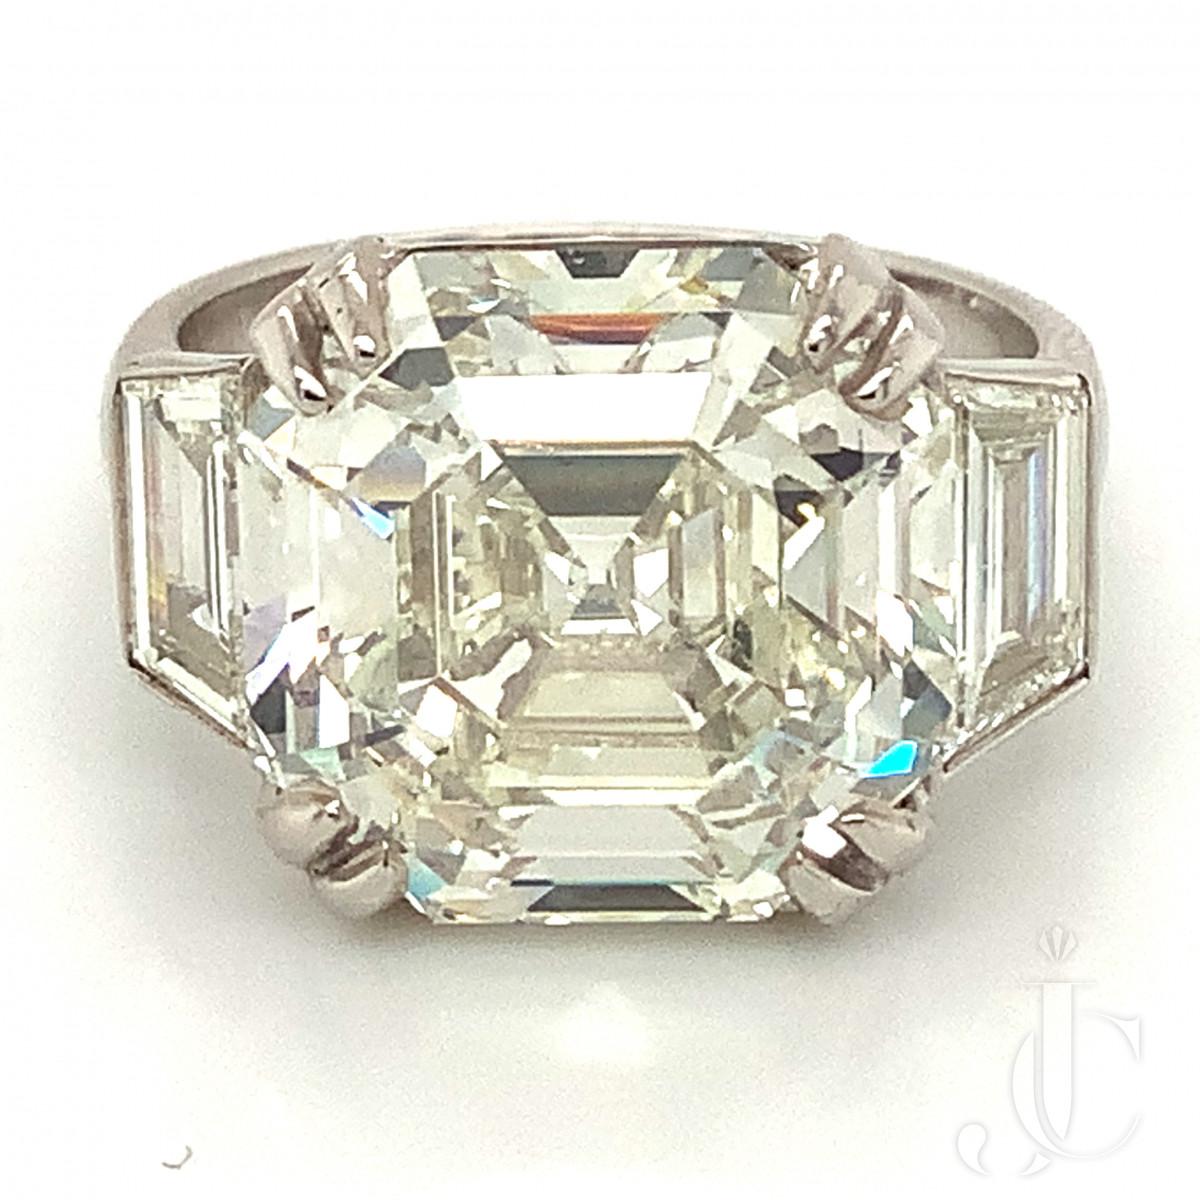 10.02ct Diamond Ring